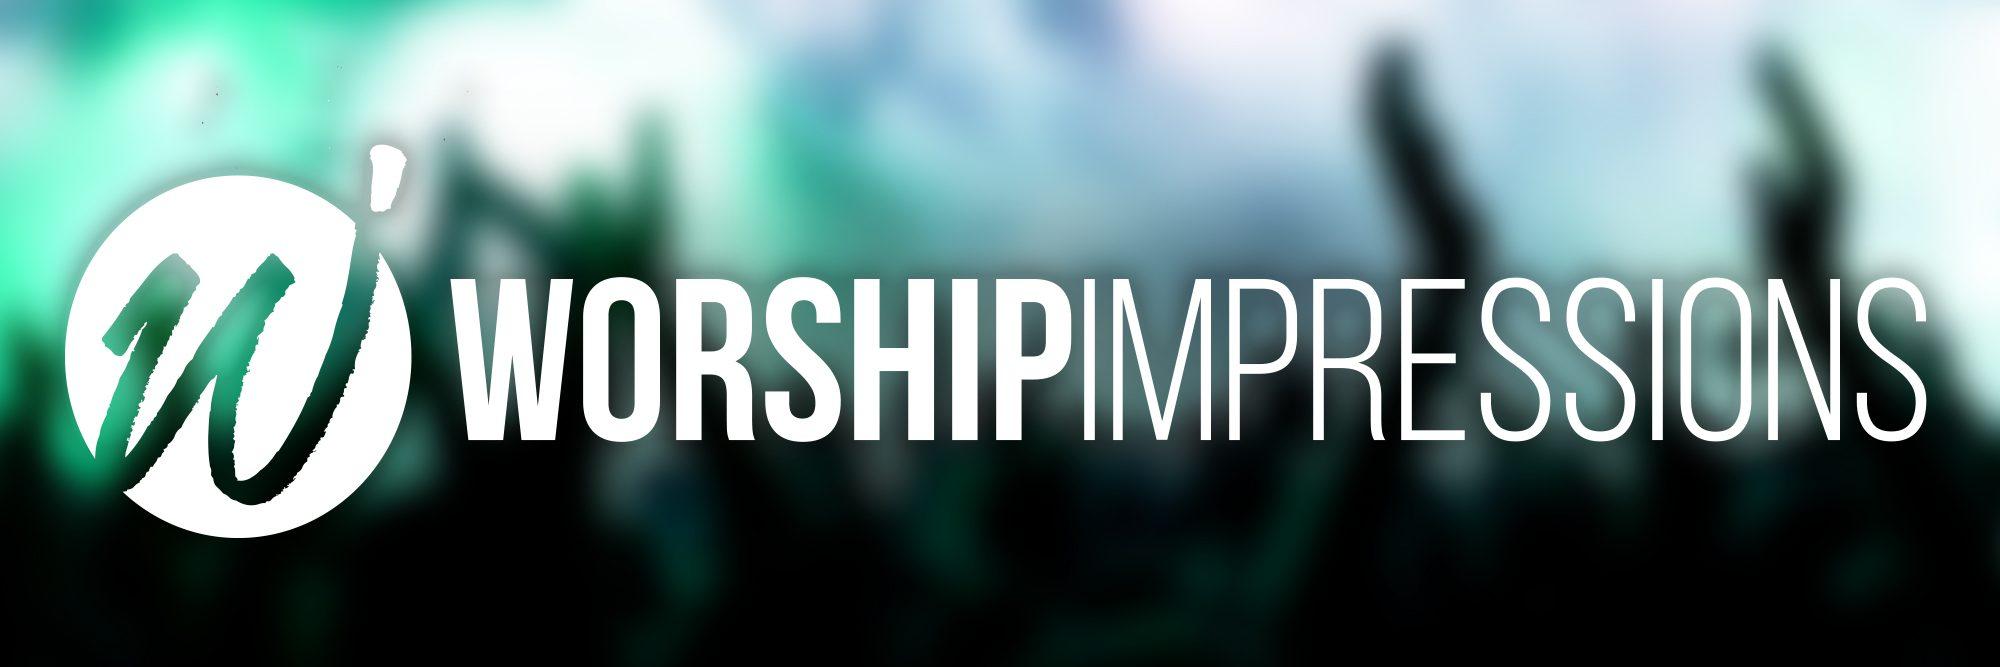 Worship Impressions